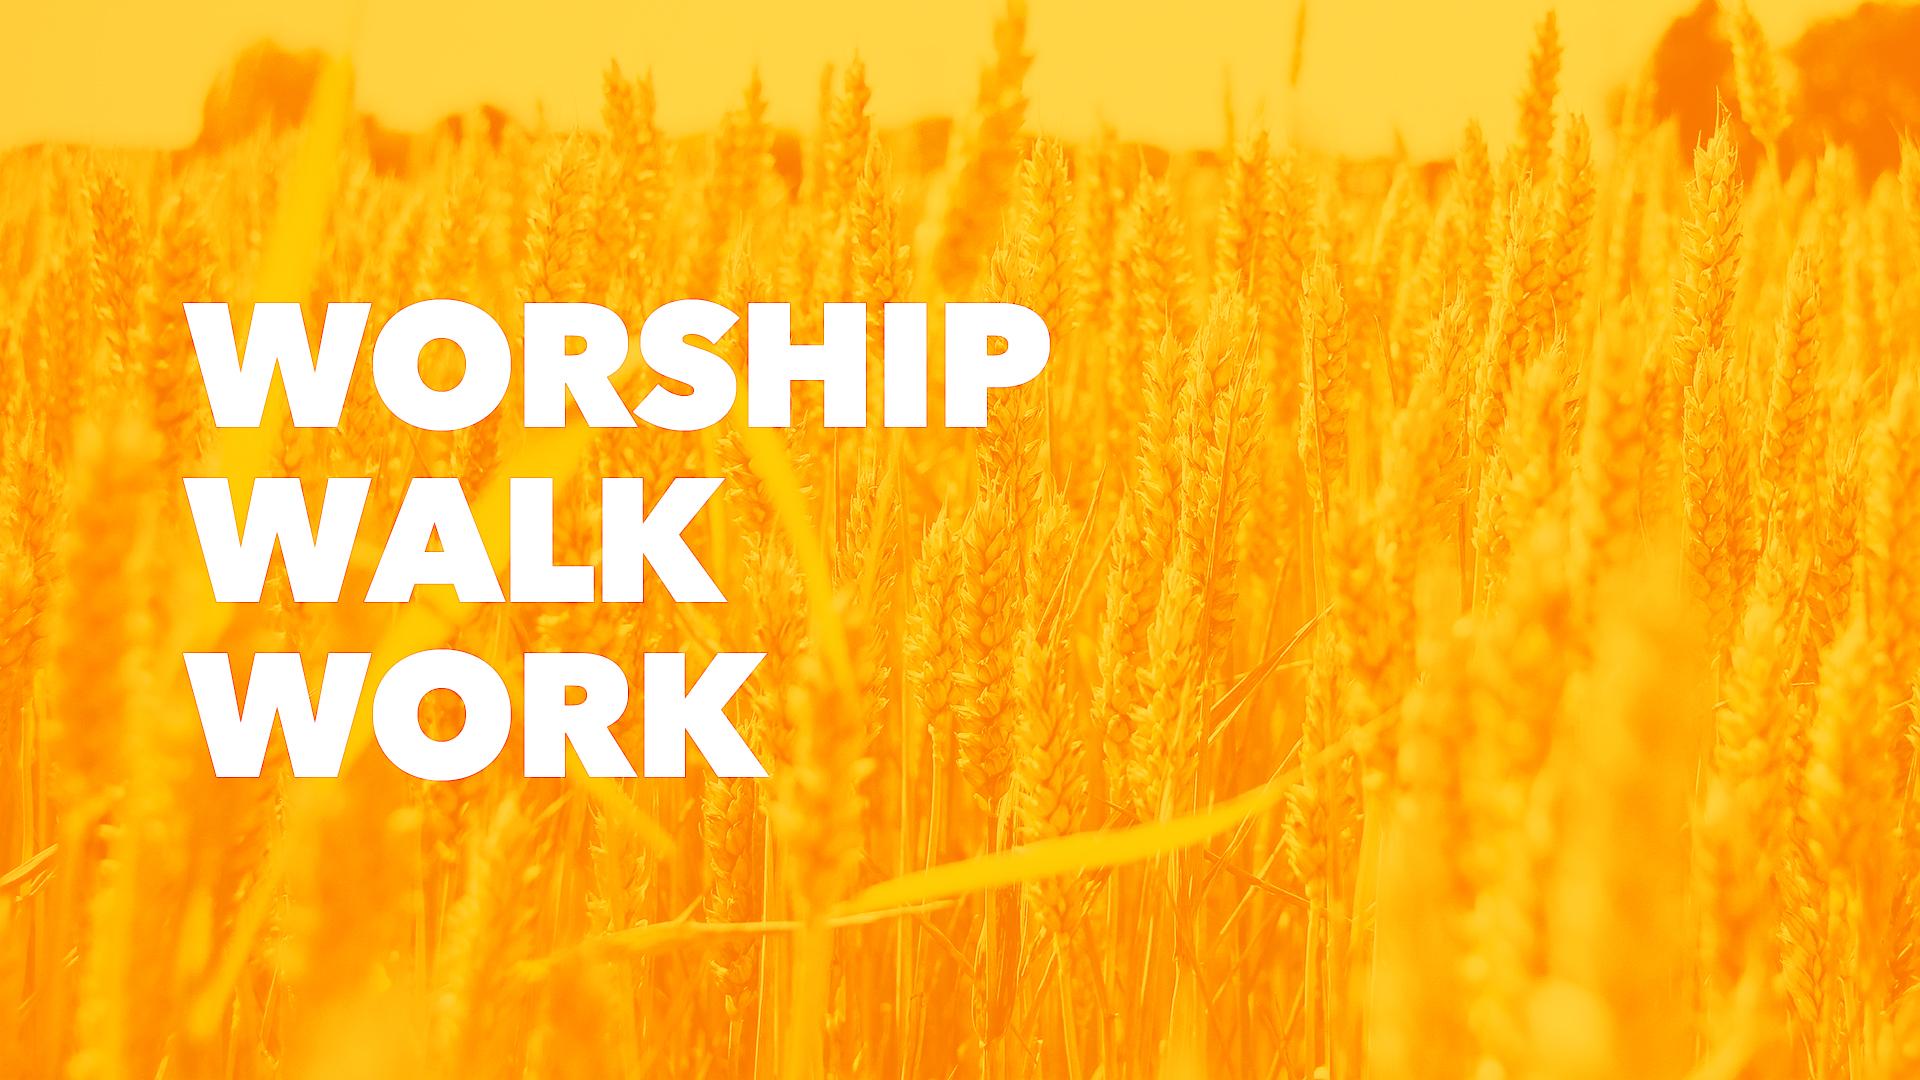 Worship Walk Work